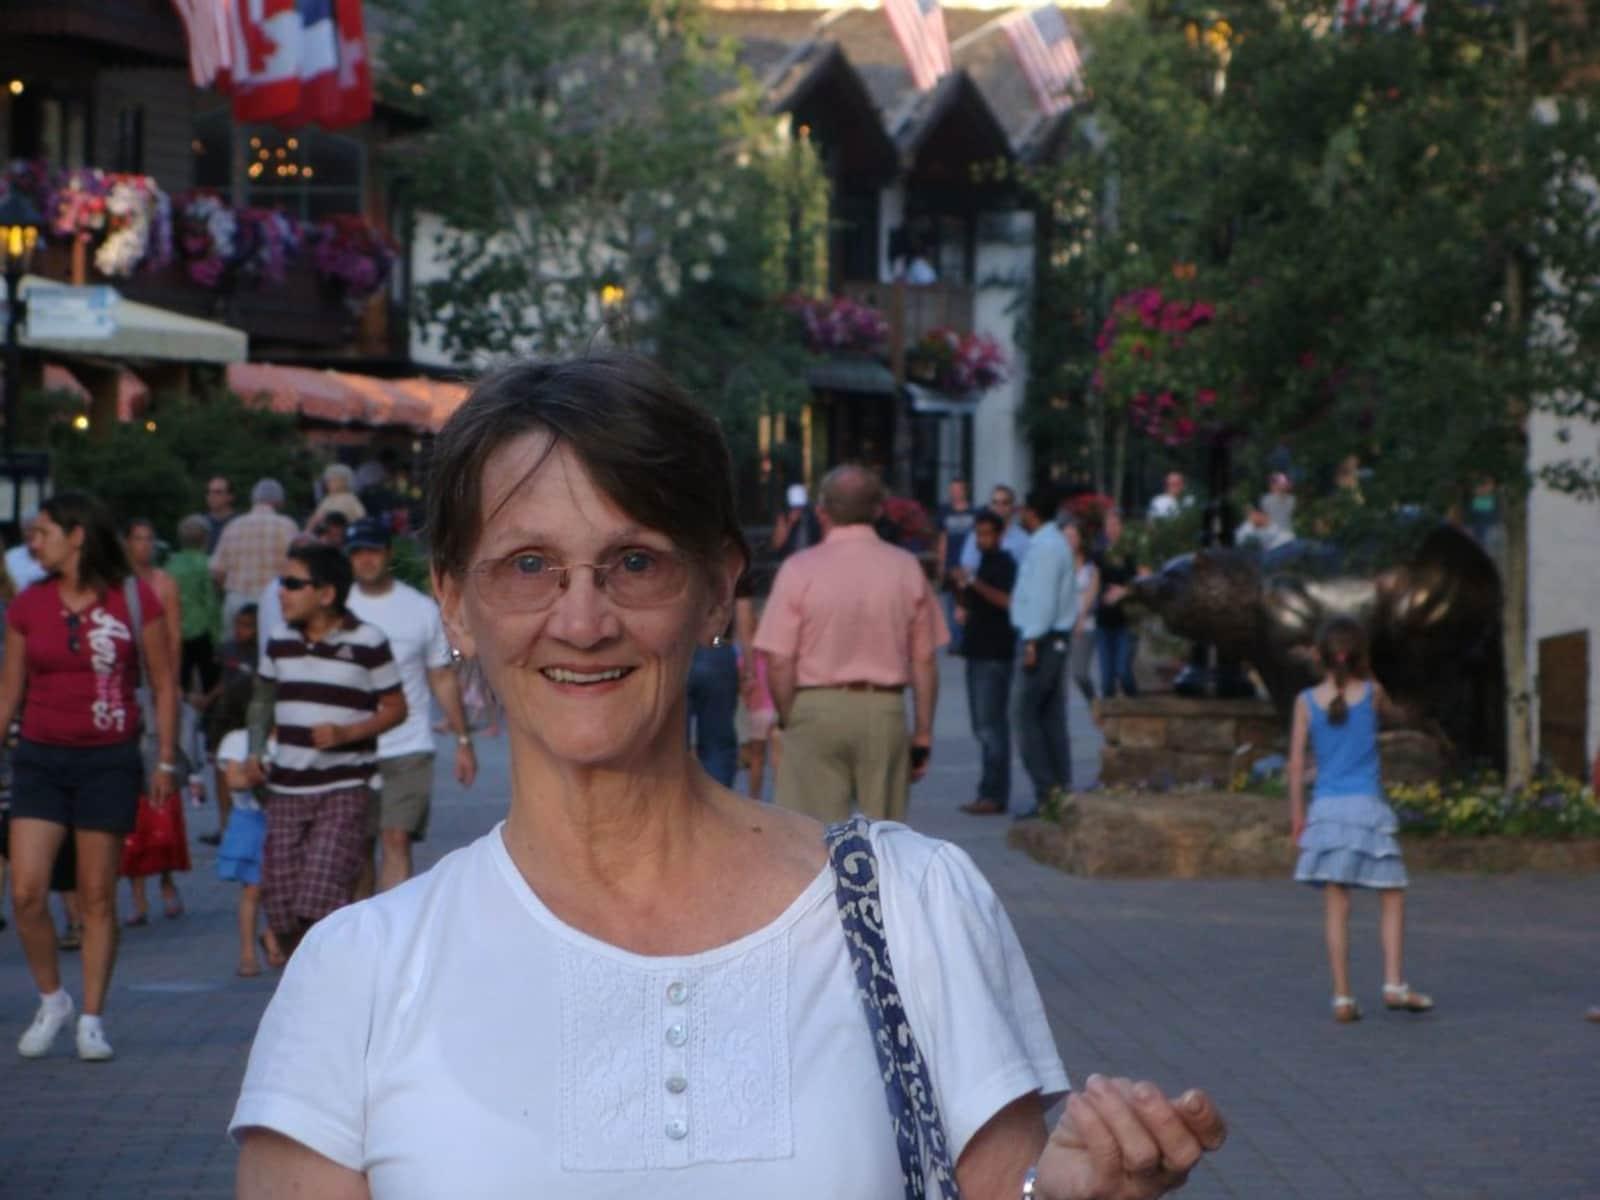 Barbara from Orlando, Florida, United States